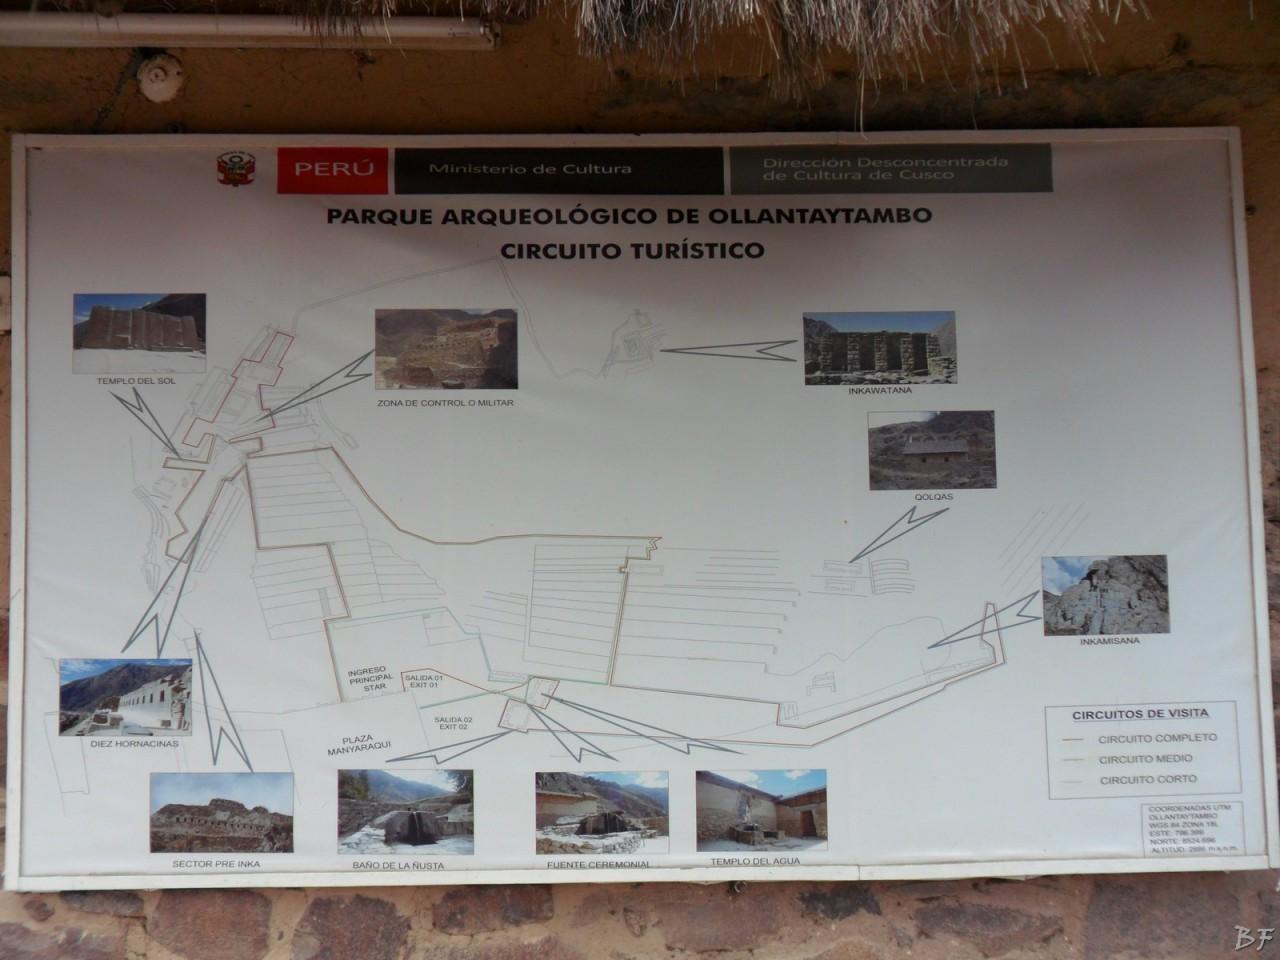 Ollantaytambo-Mura-Megalitiche-Peru-12